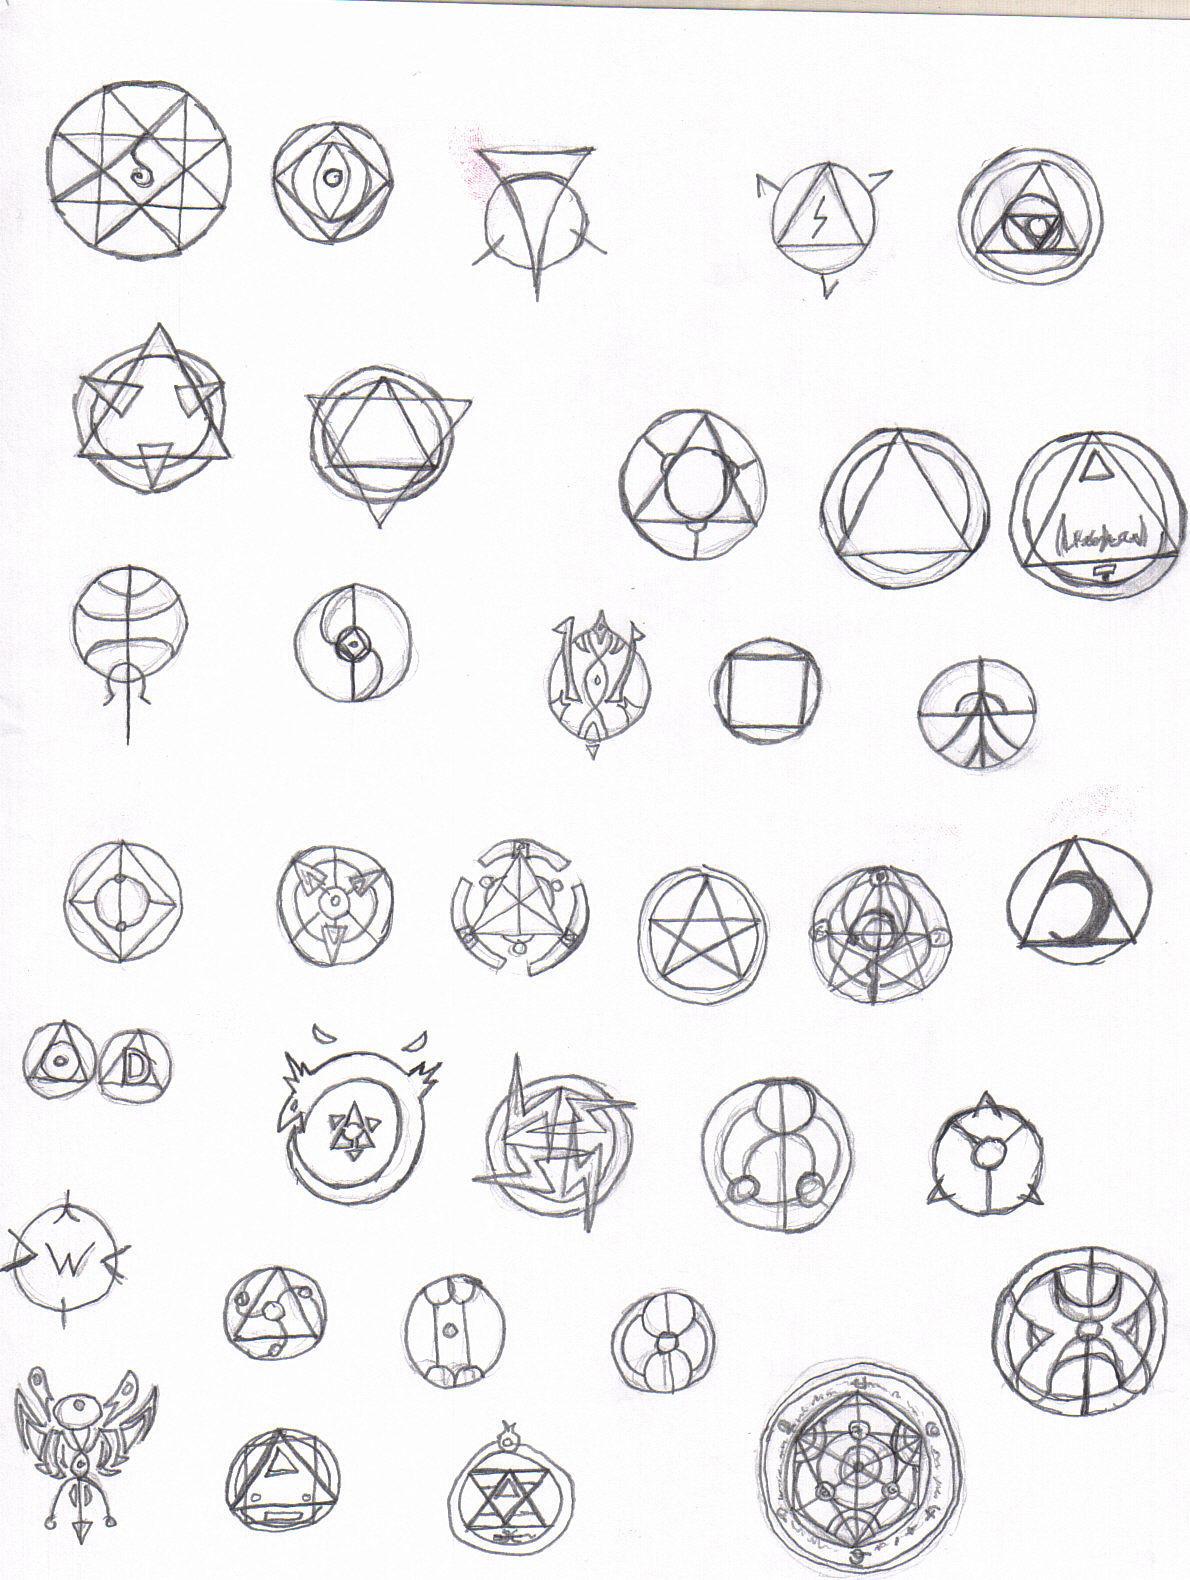 Alchemy symbols by deathjr on DeviantArt